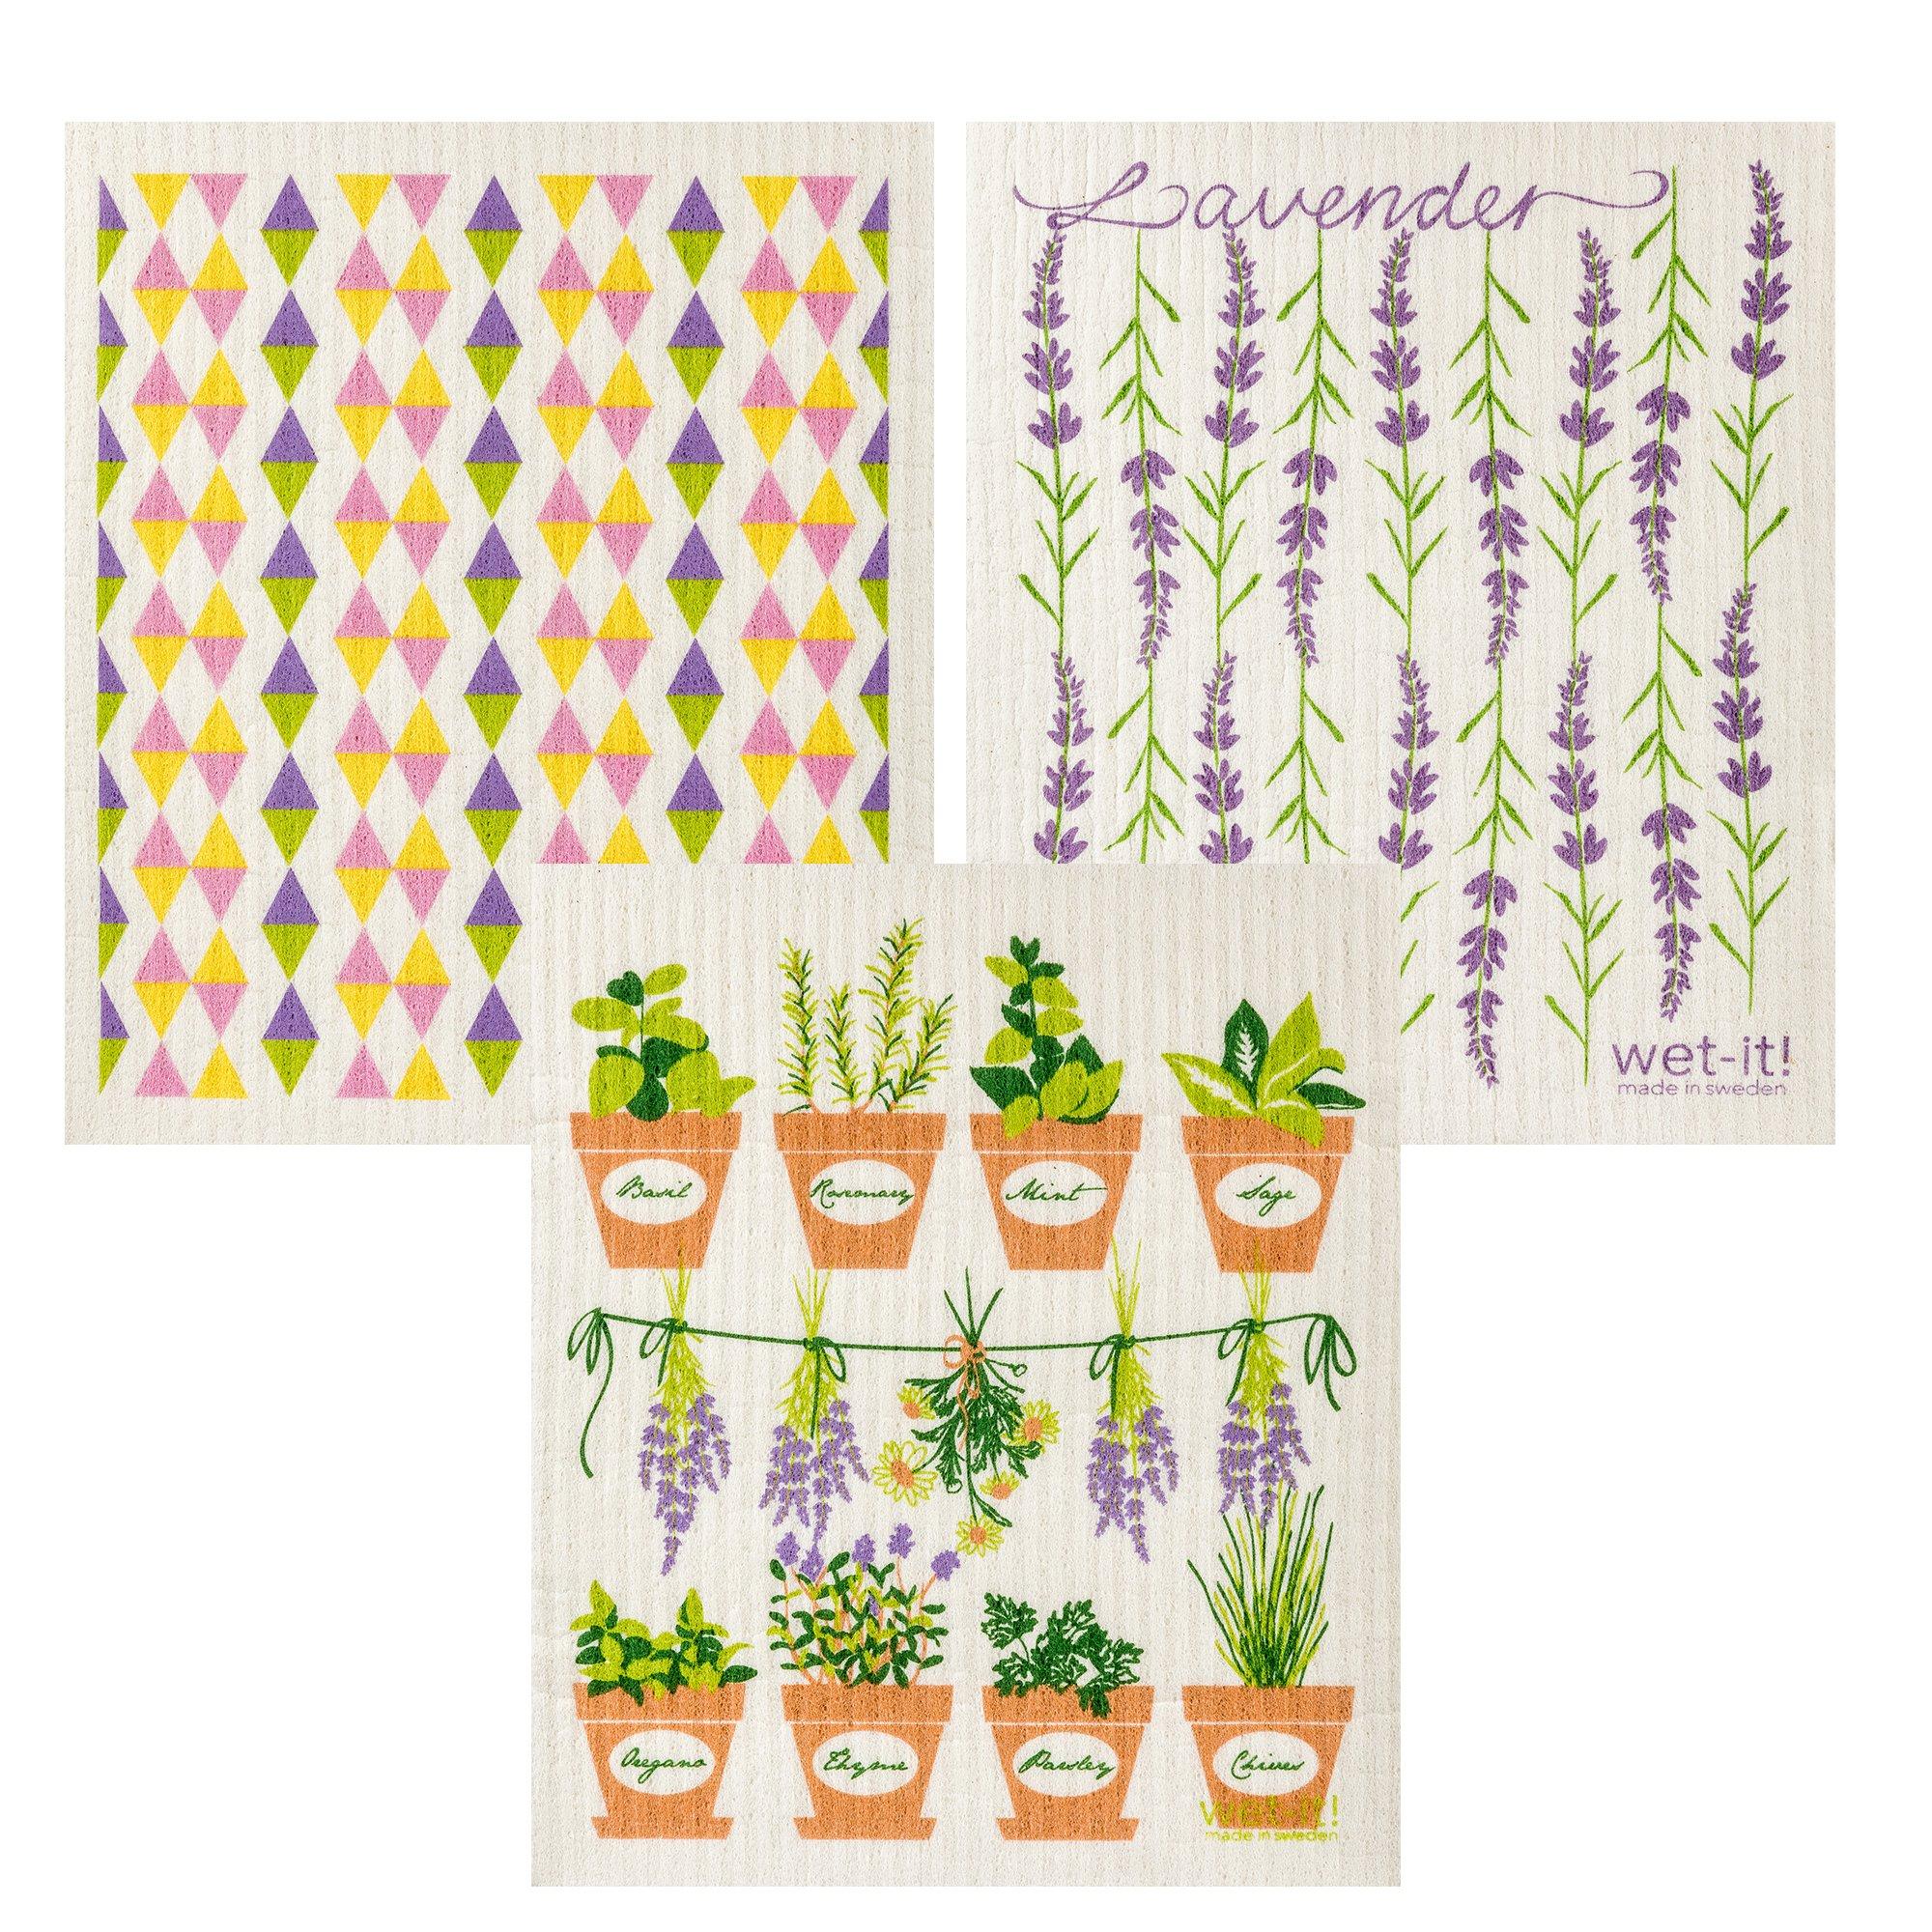 Wet-It Swedish Dishcloth Set of 3 (Lavender, Herb Pots, Pastel Triangles)